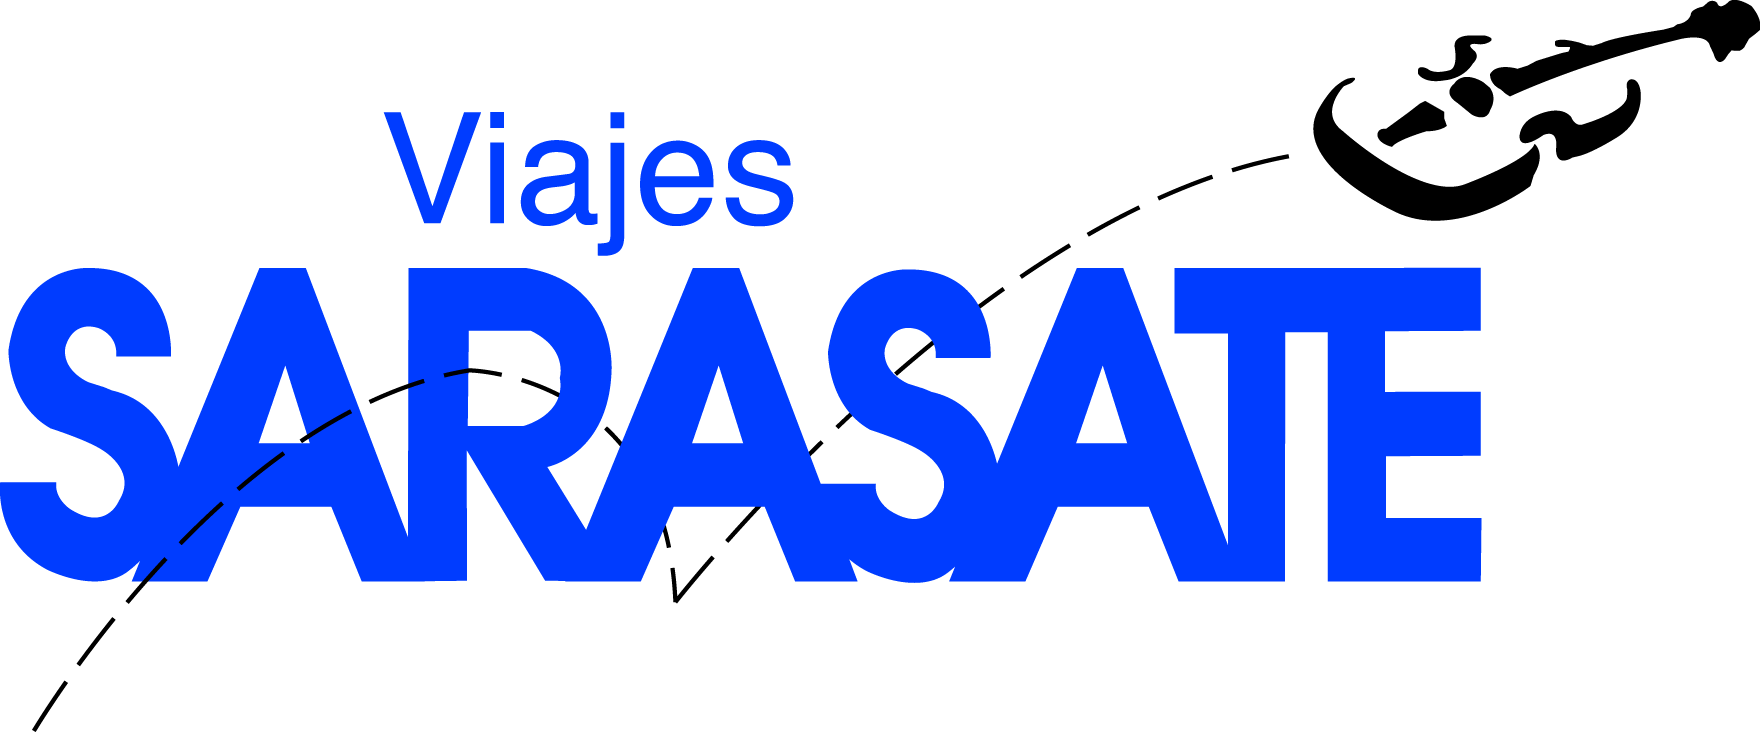 Sarasate